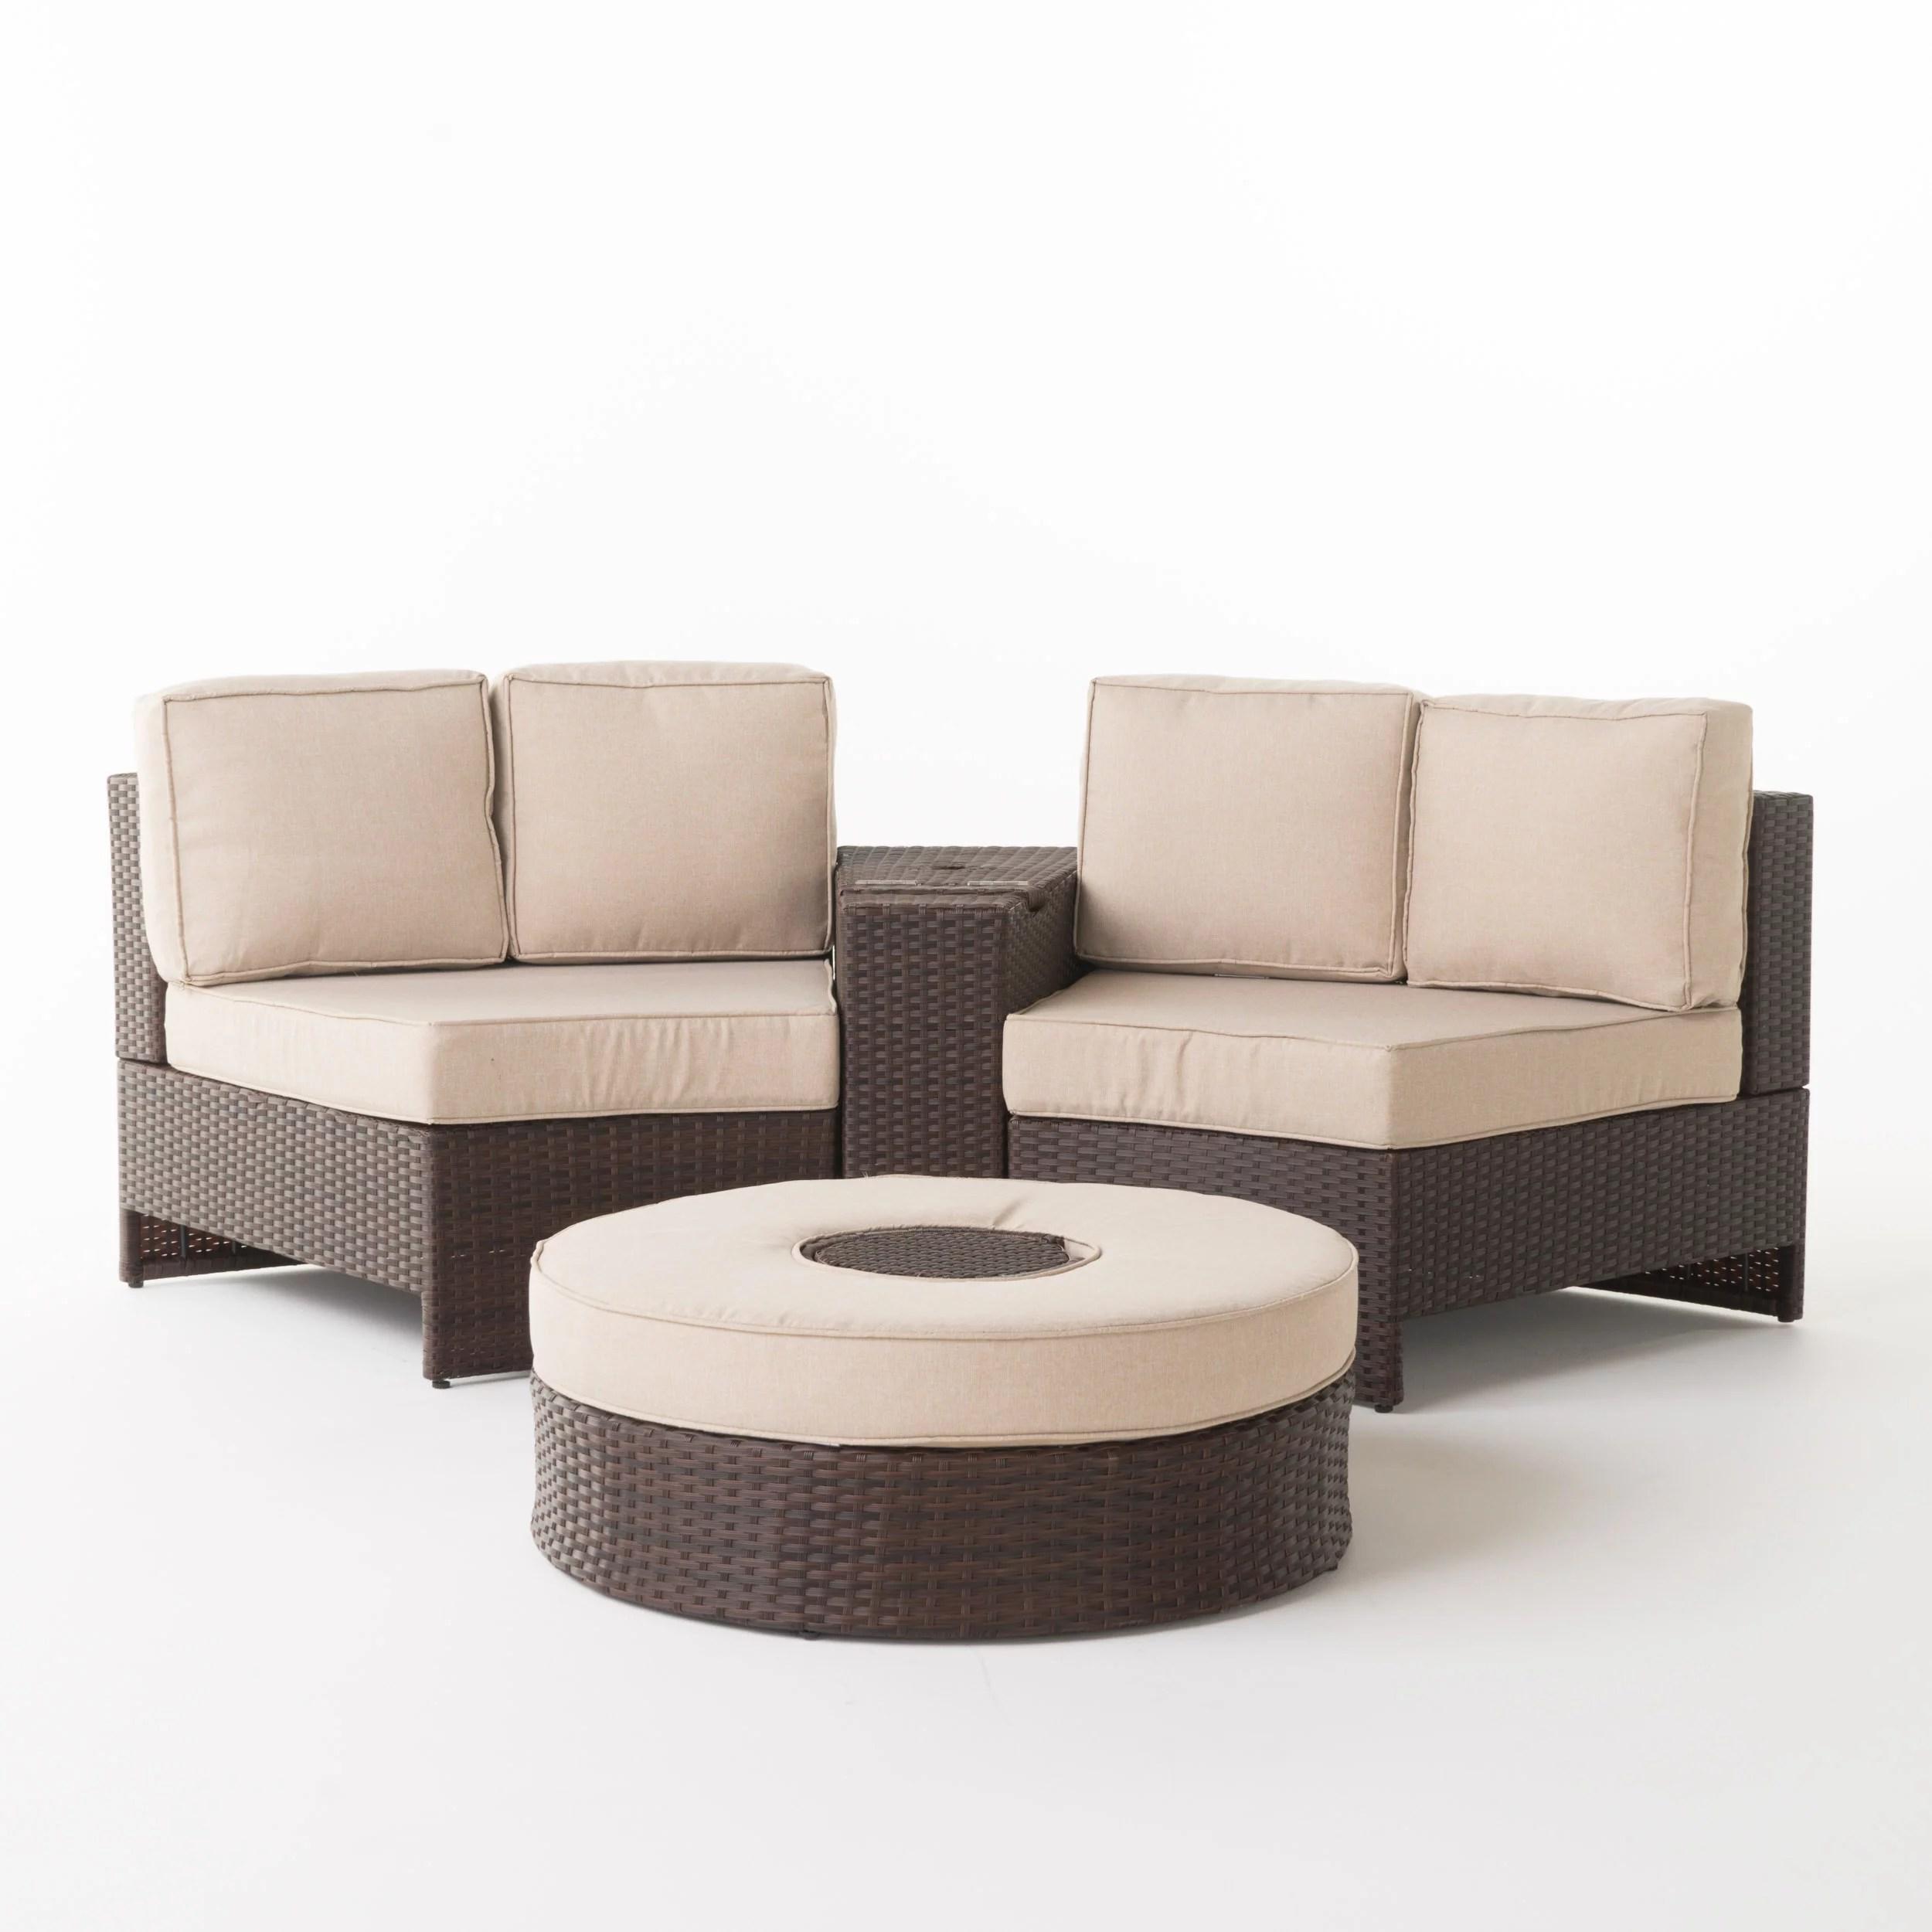 alicante outdoor wicker 4 piece semi circle seating set with ice bucket ottoman beige walmart com